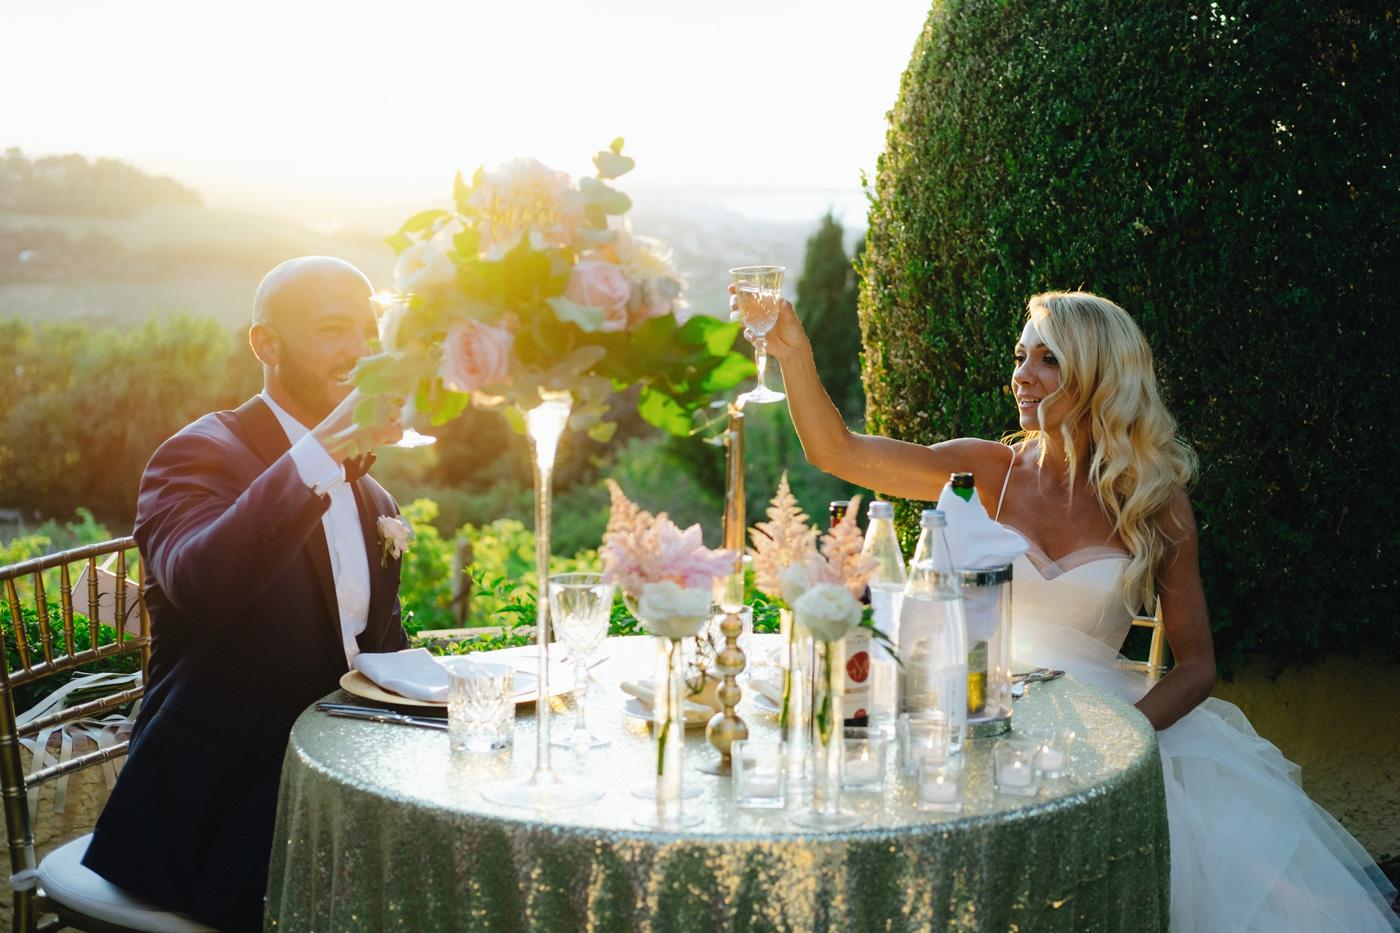 Matrimoni all'italiana wedding photographer italy-127.jpg